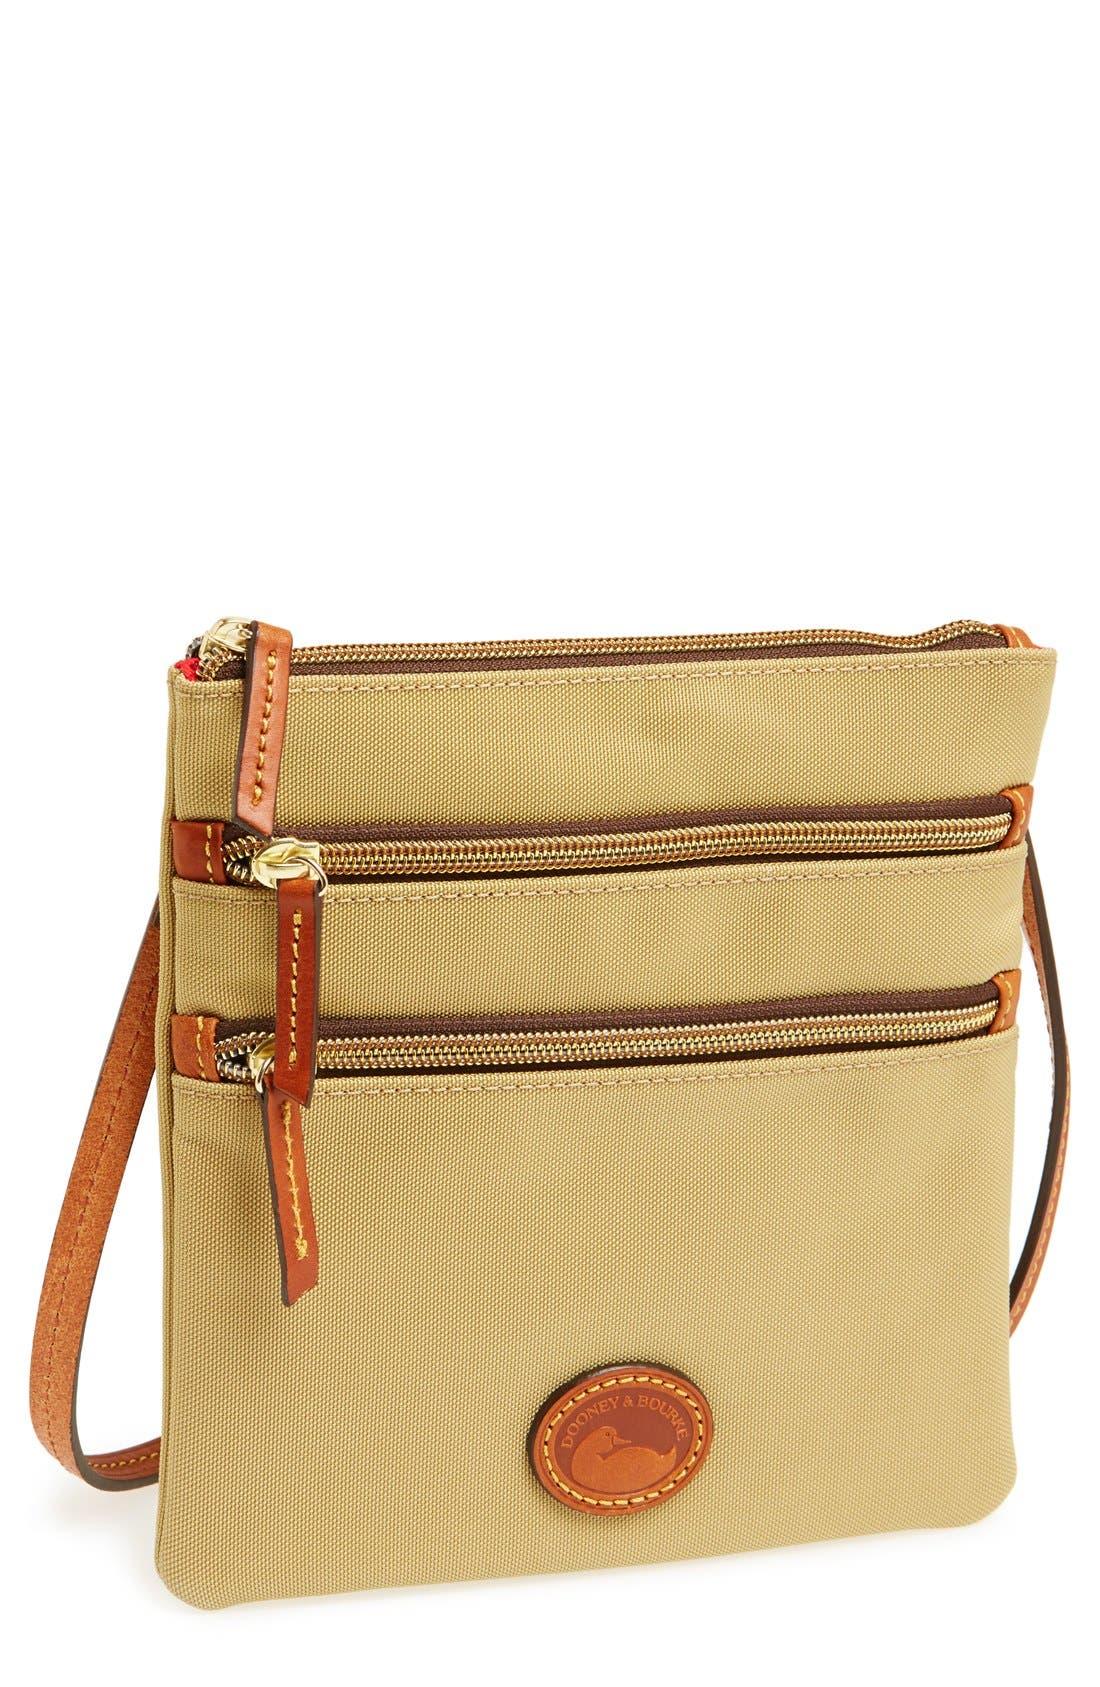 Alternate Image 1 Selected - Dooney & Bourke Triple Zip Nylon Crossbody Bag